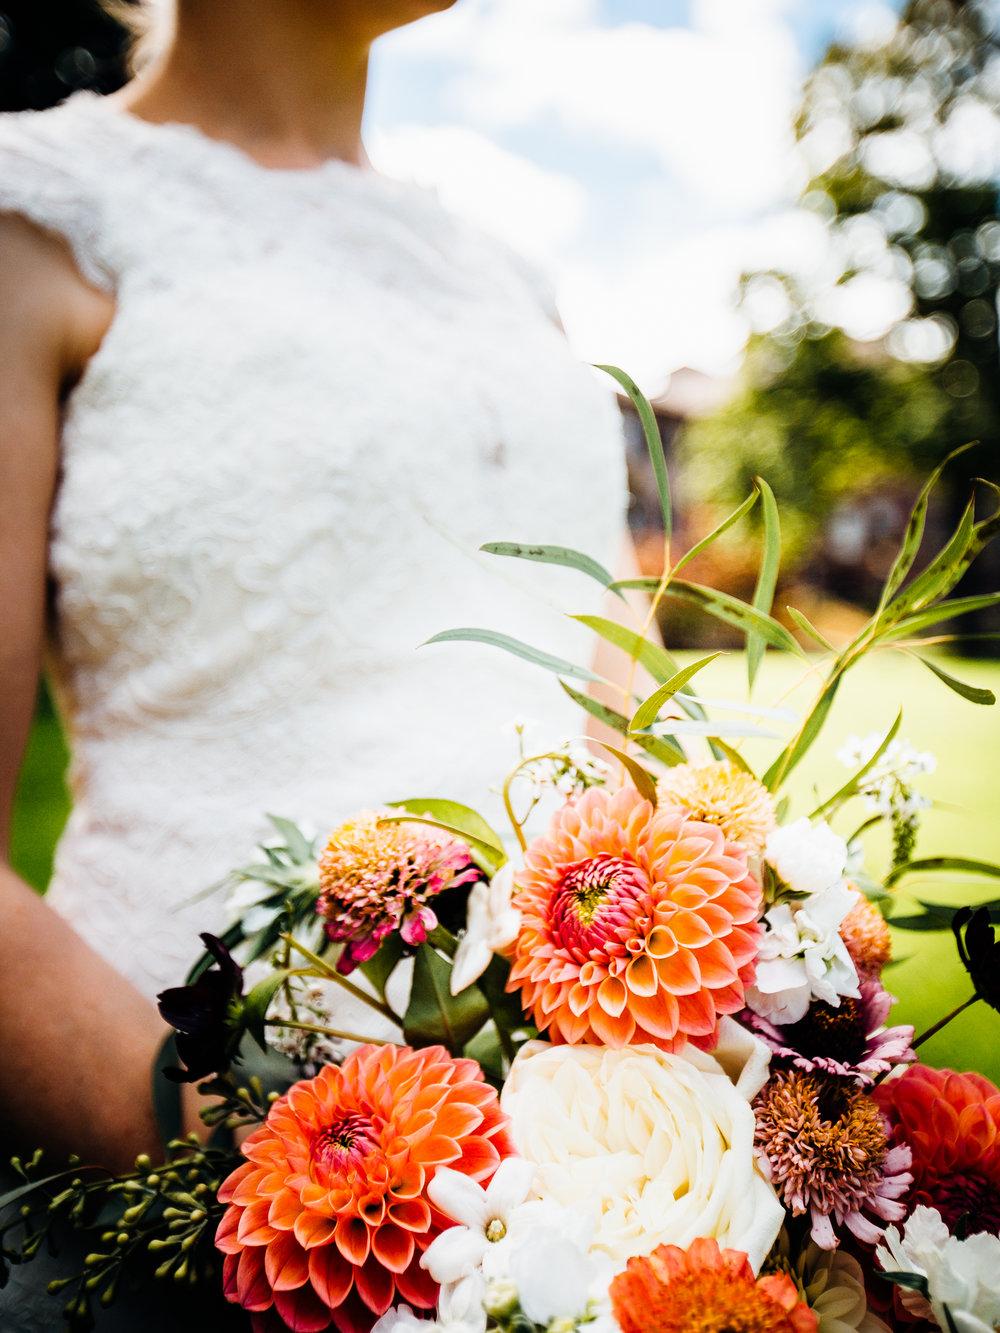 AndrewBrownPhotography-Weddings-62.jpg